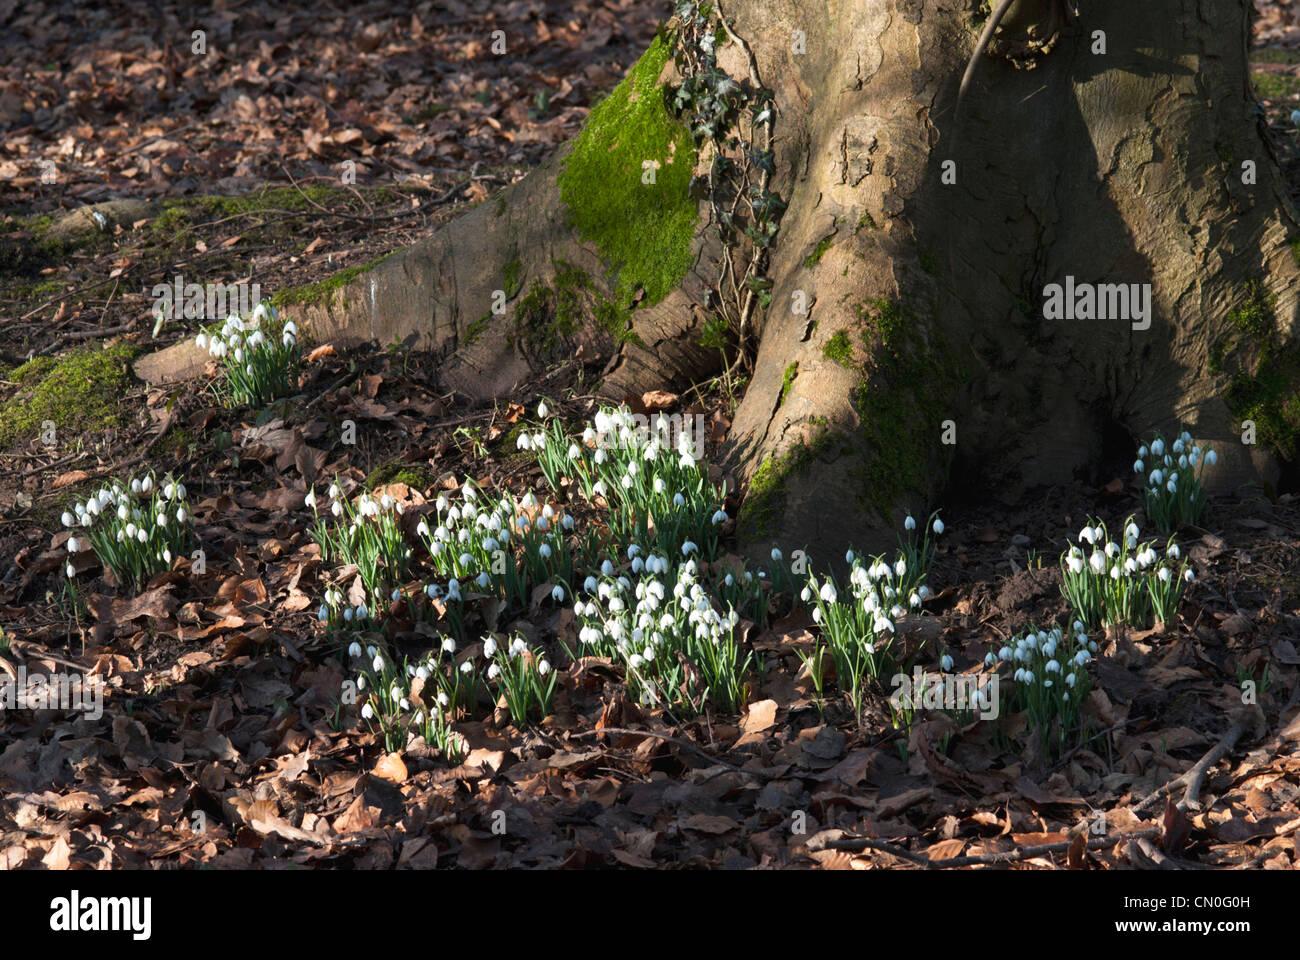 Galanthus nivalis, Snowdrop - Stock Image